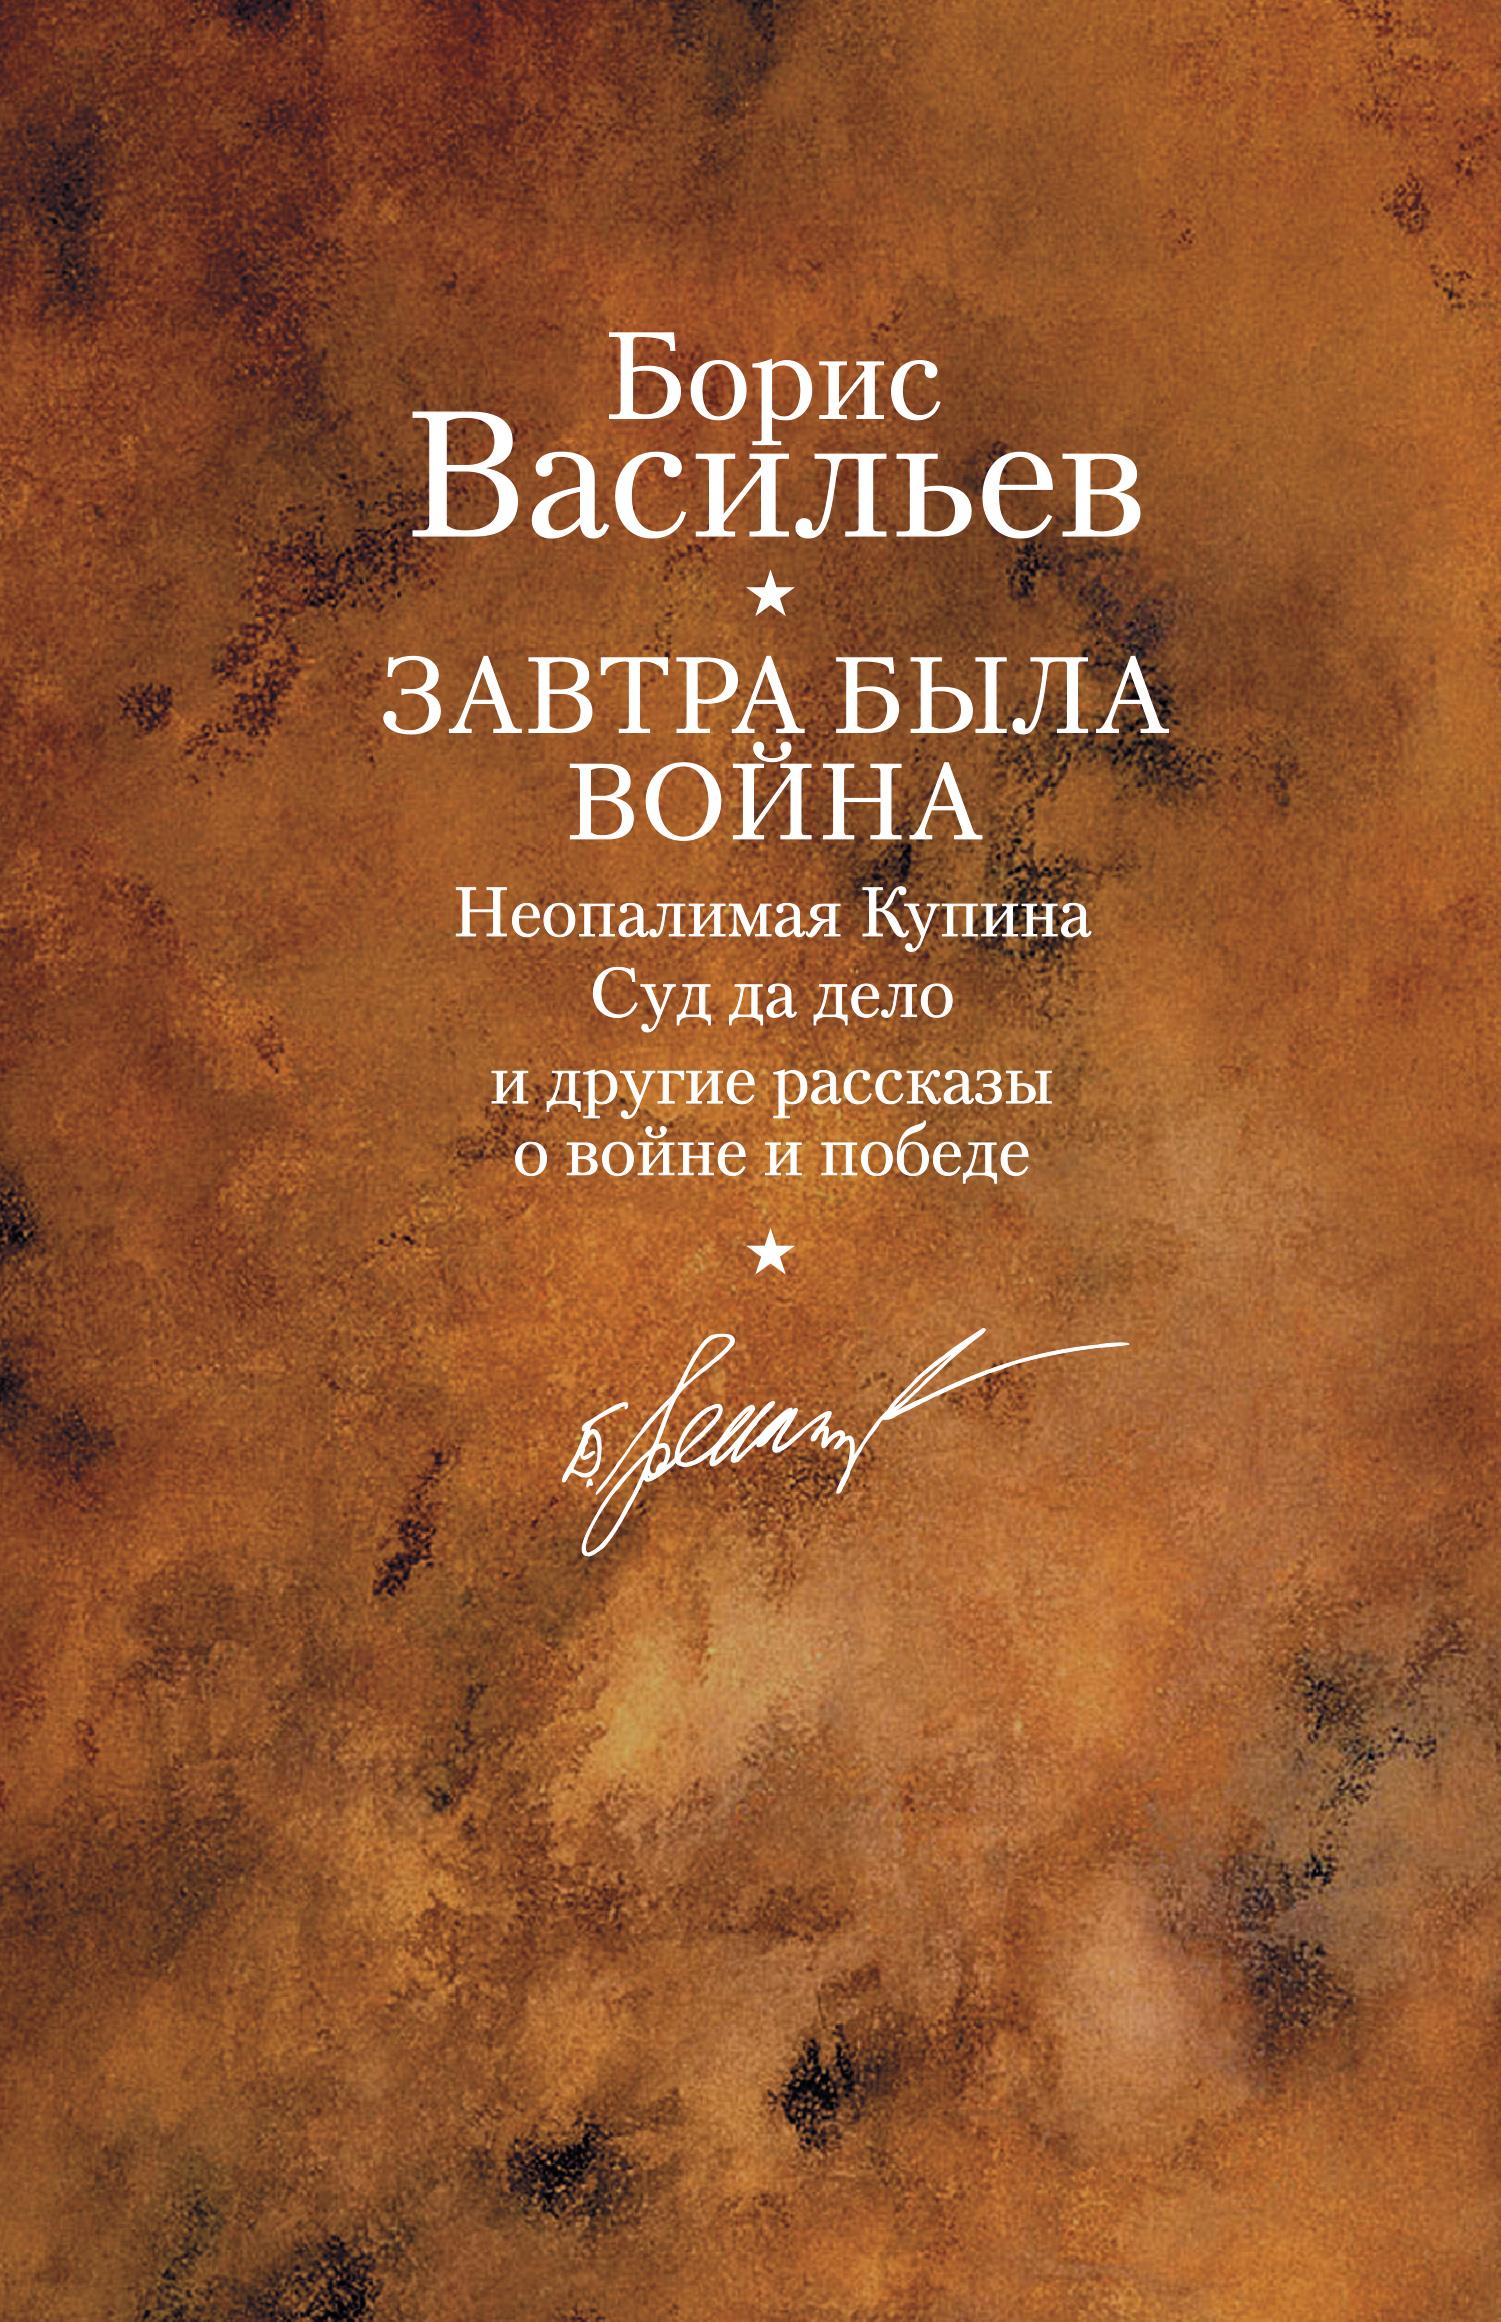 Борис Васильев Неопалимая купина борис васильев ветеран